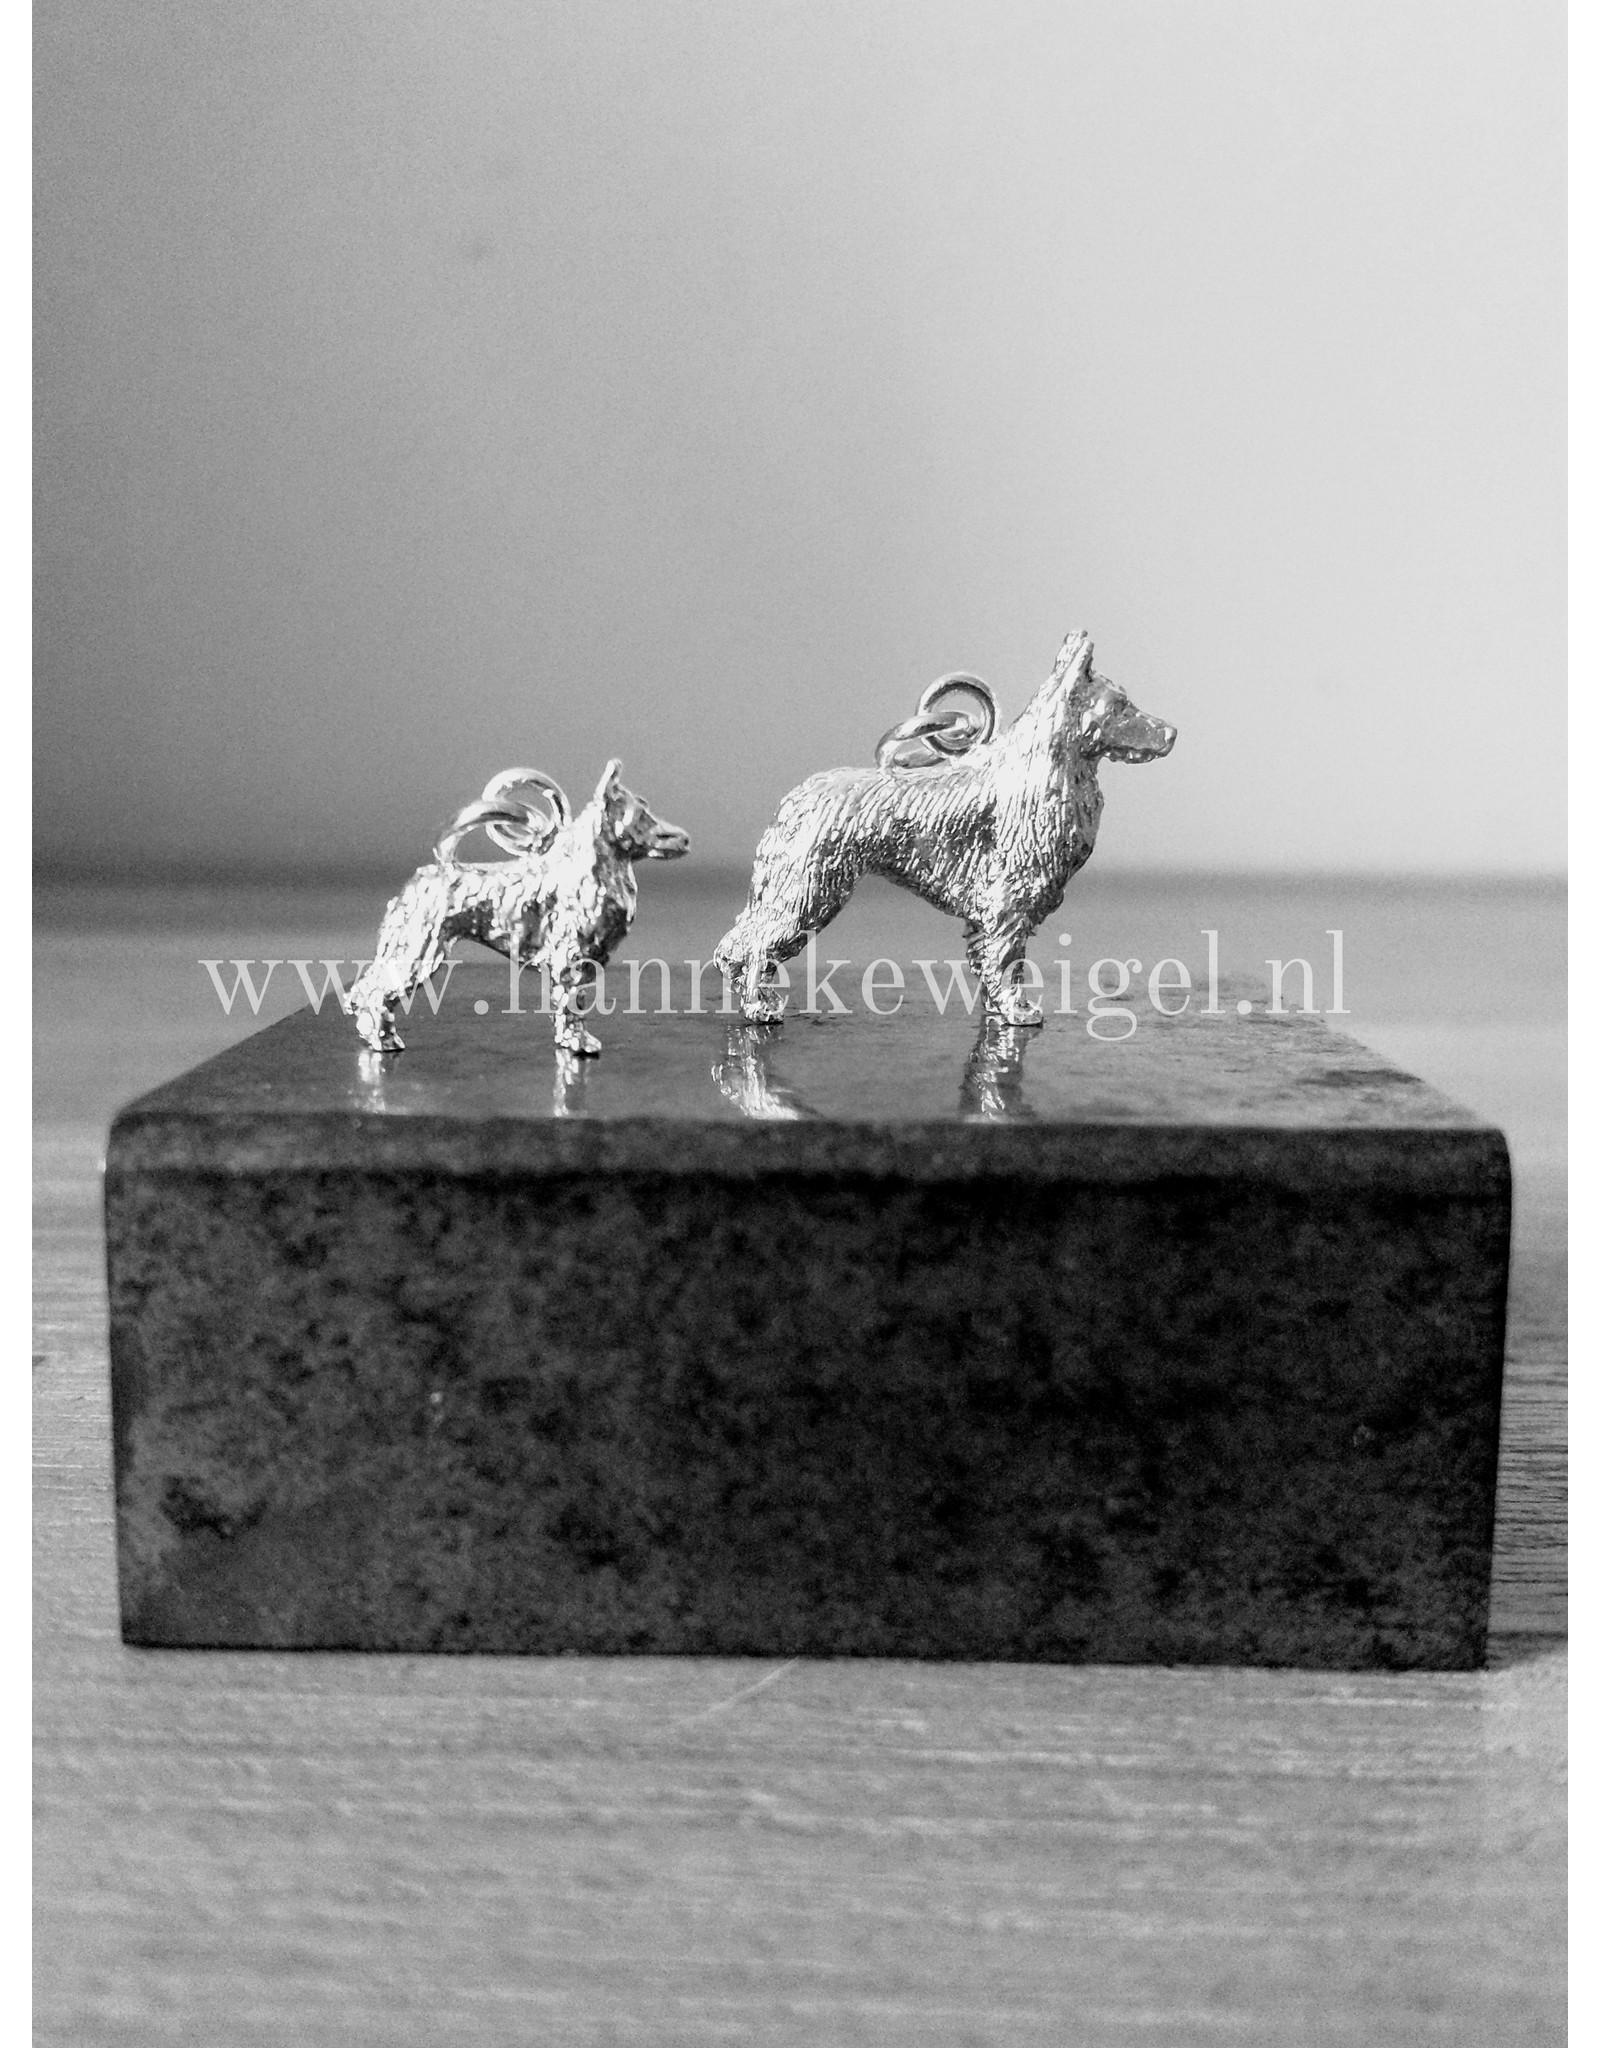 Handmade by Hanneke Weigel Zilveren Tervurense herder